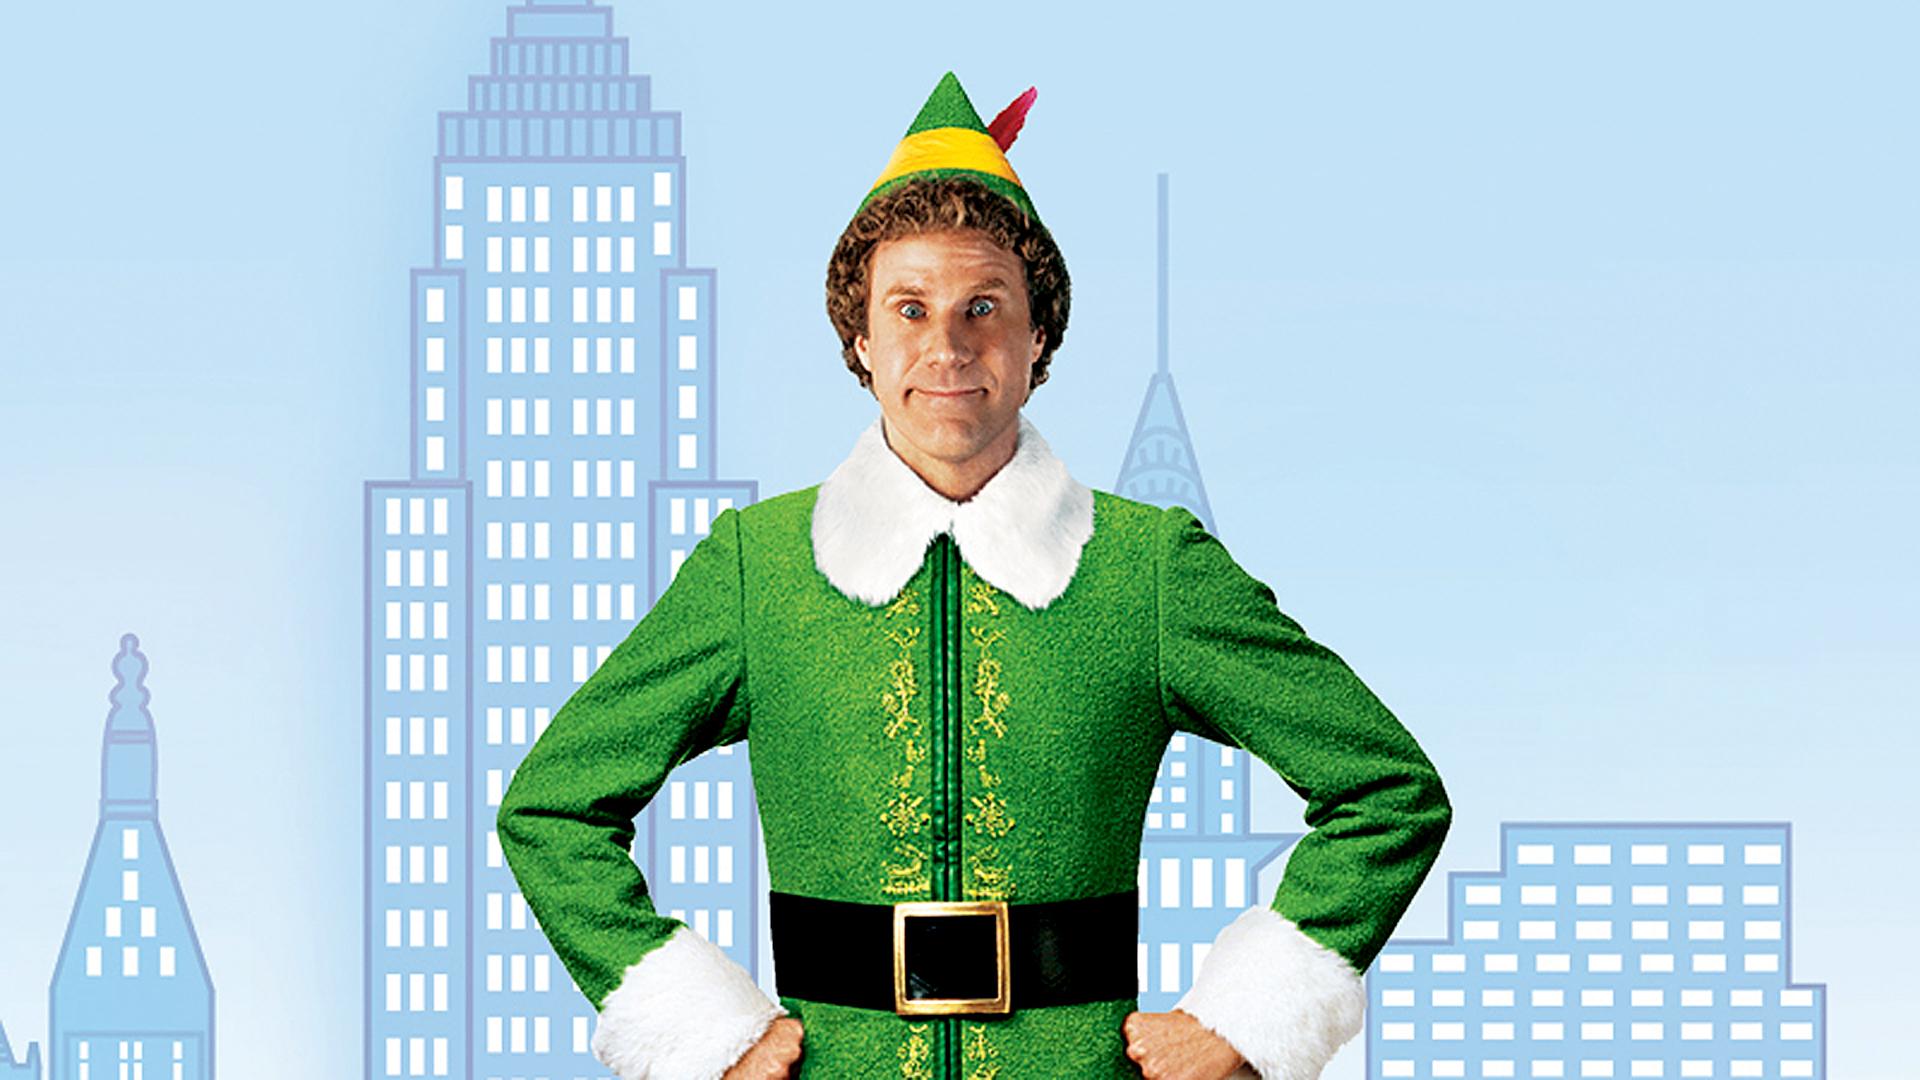 Elfen clipart elf movie Wallpapers Wallpaper Movie HD Elf